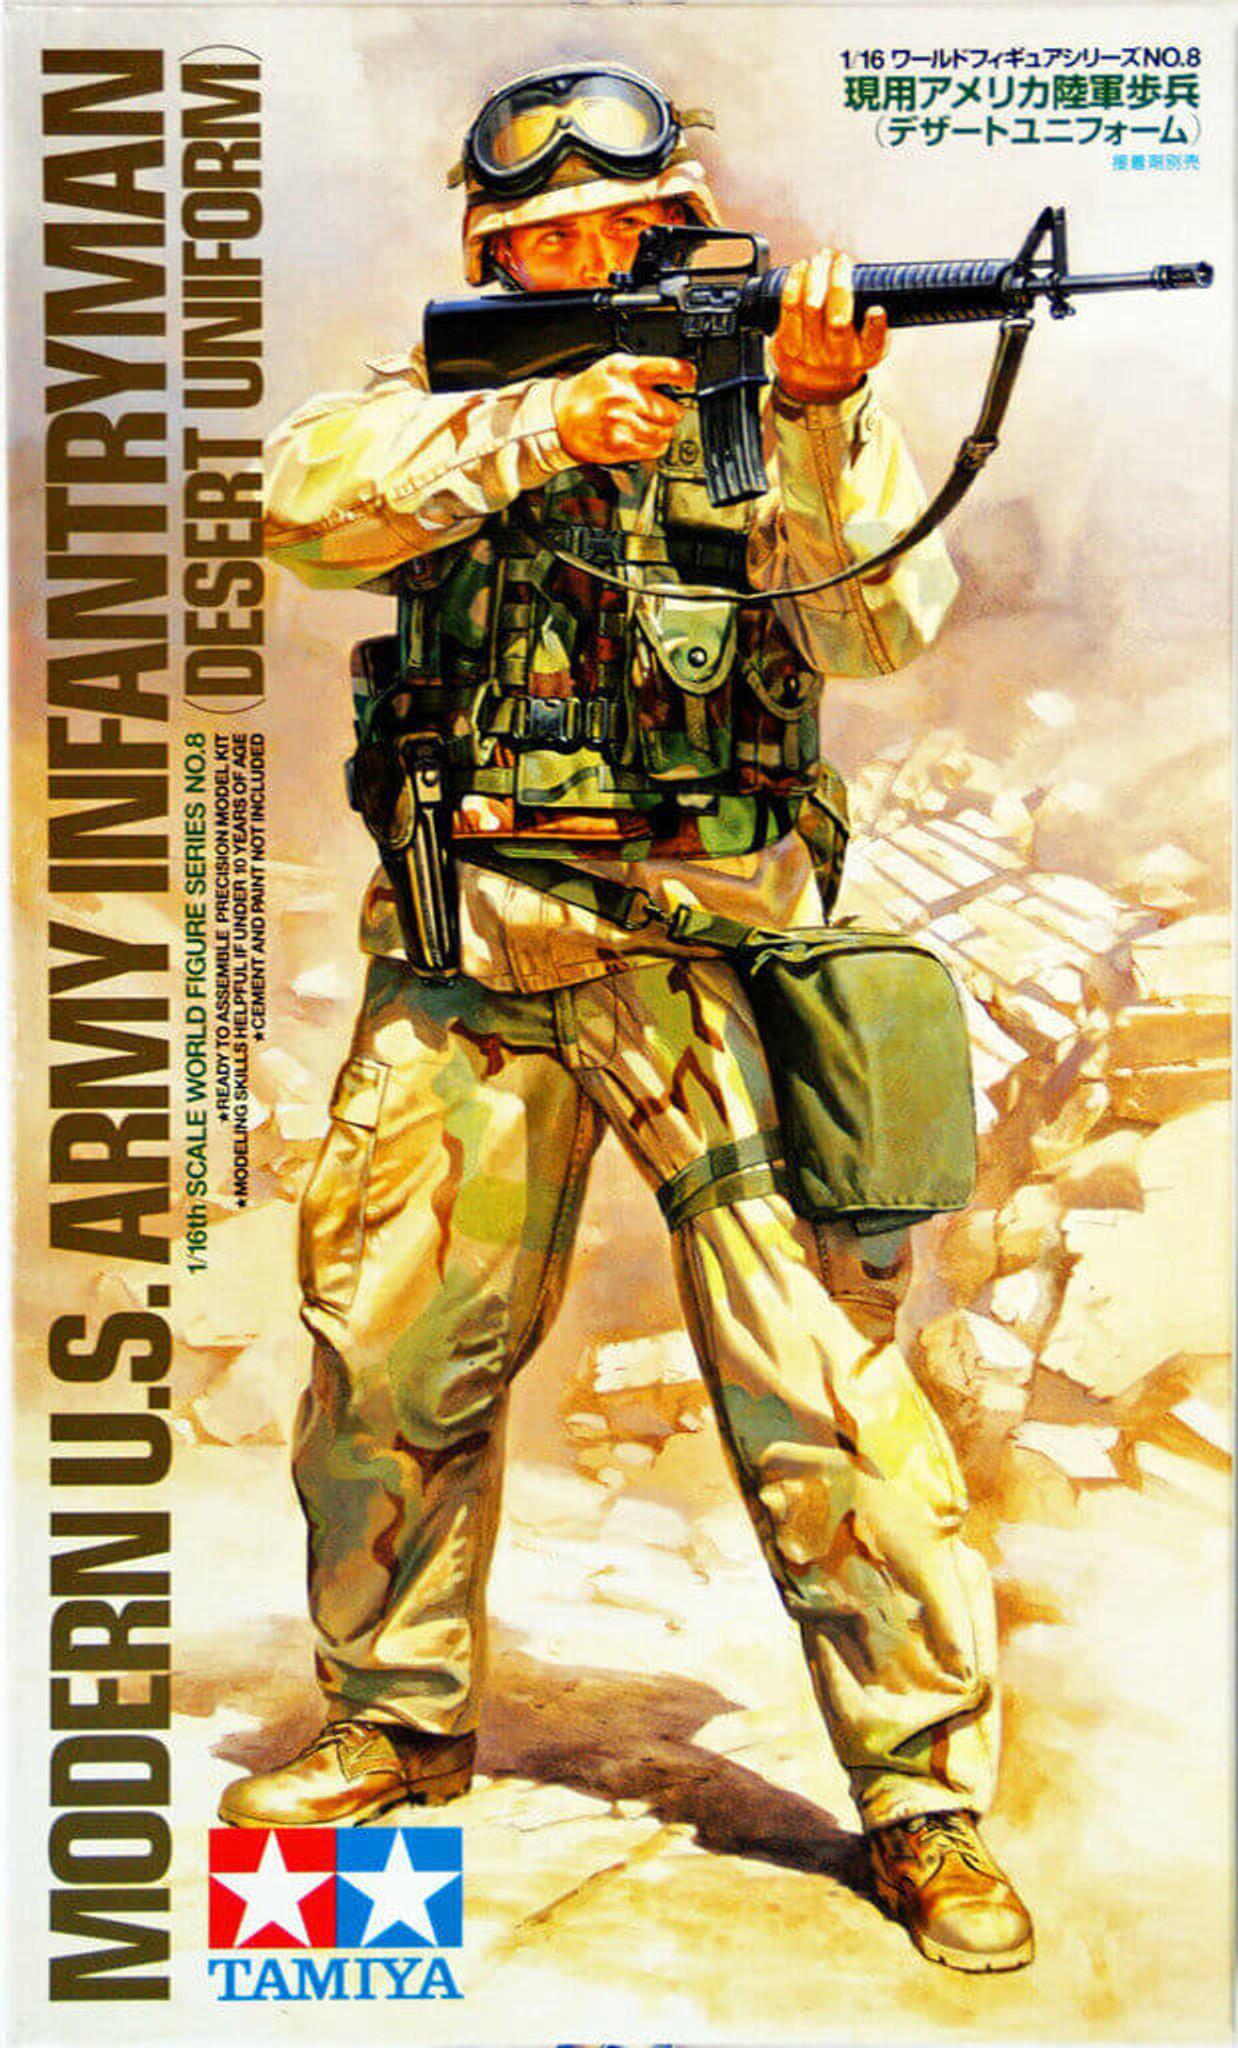 Soldiers, Figures Tamiya 36308 Modern US Army Infantryman 1/16 Scale Plastic Model Figure